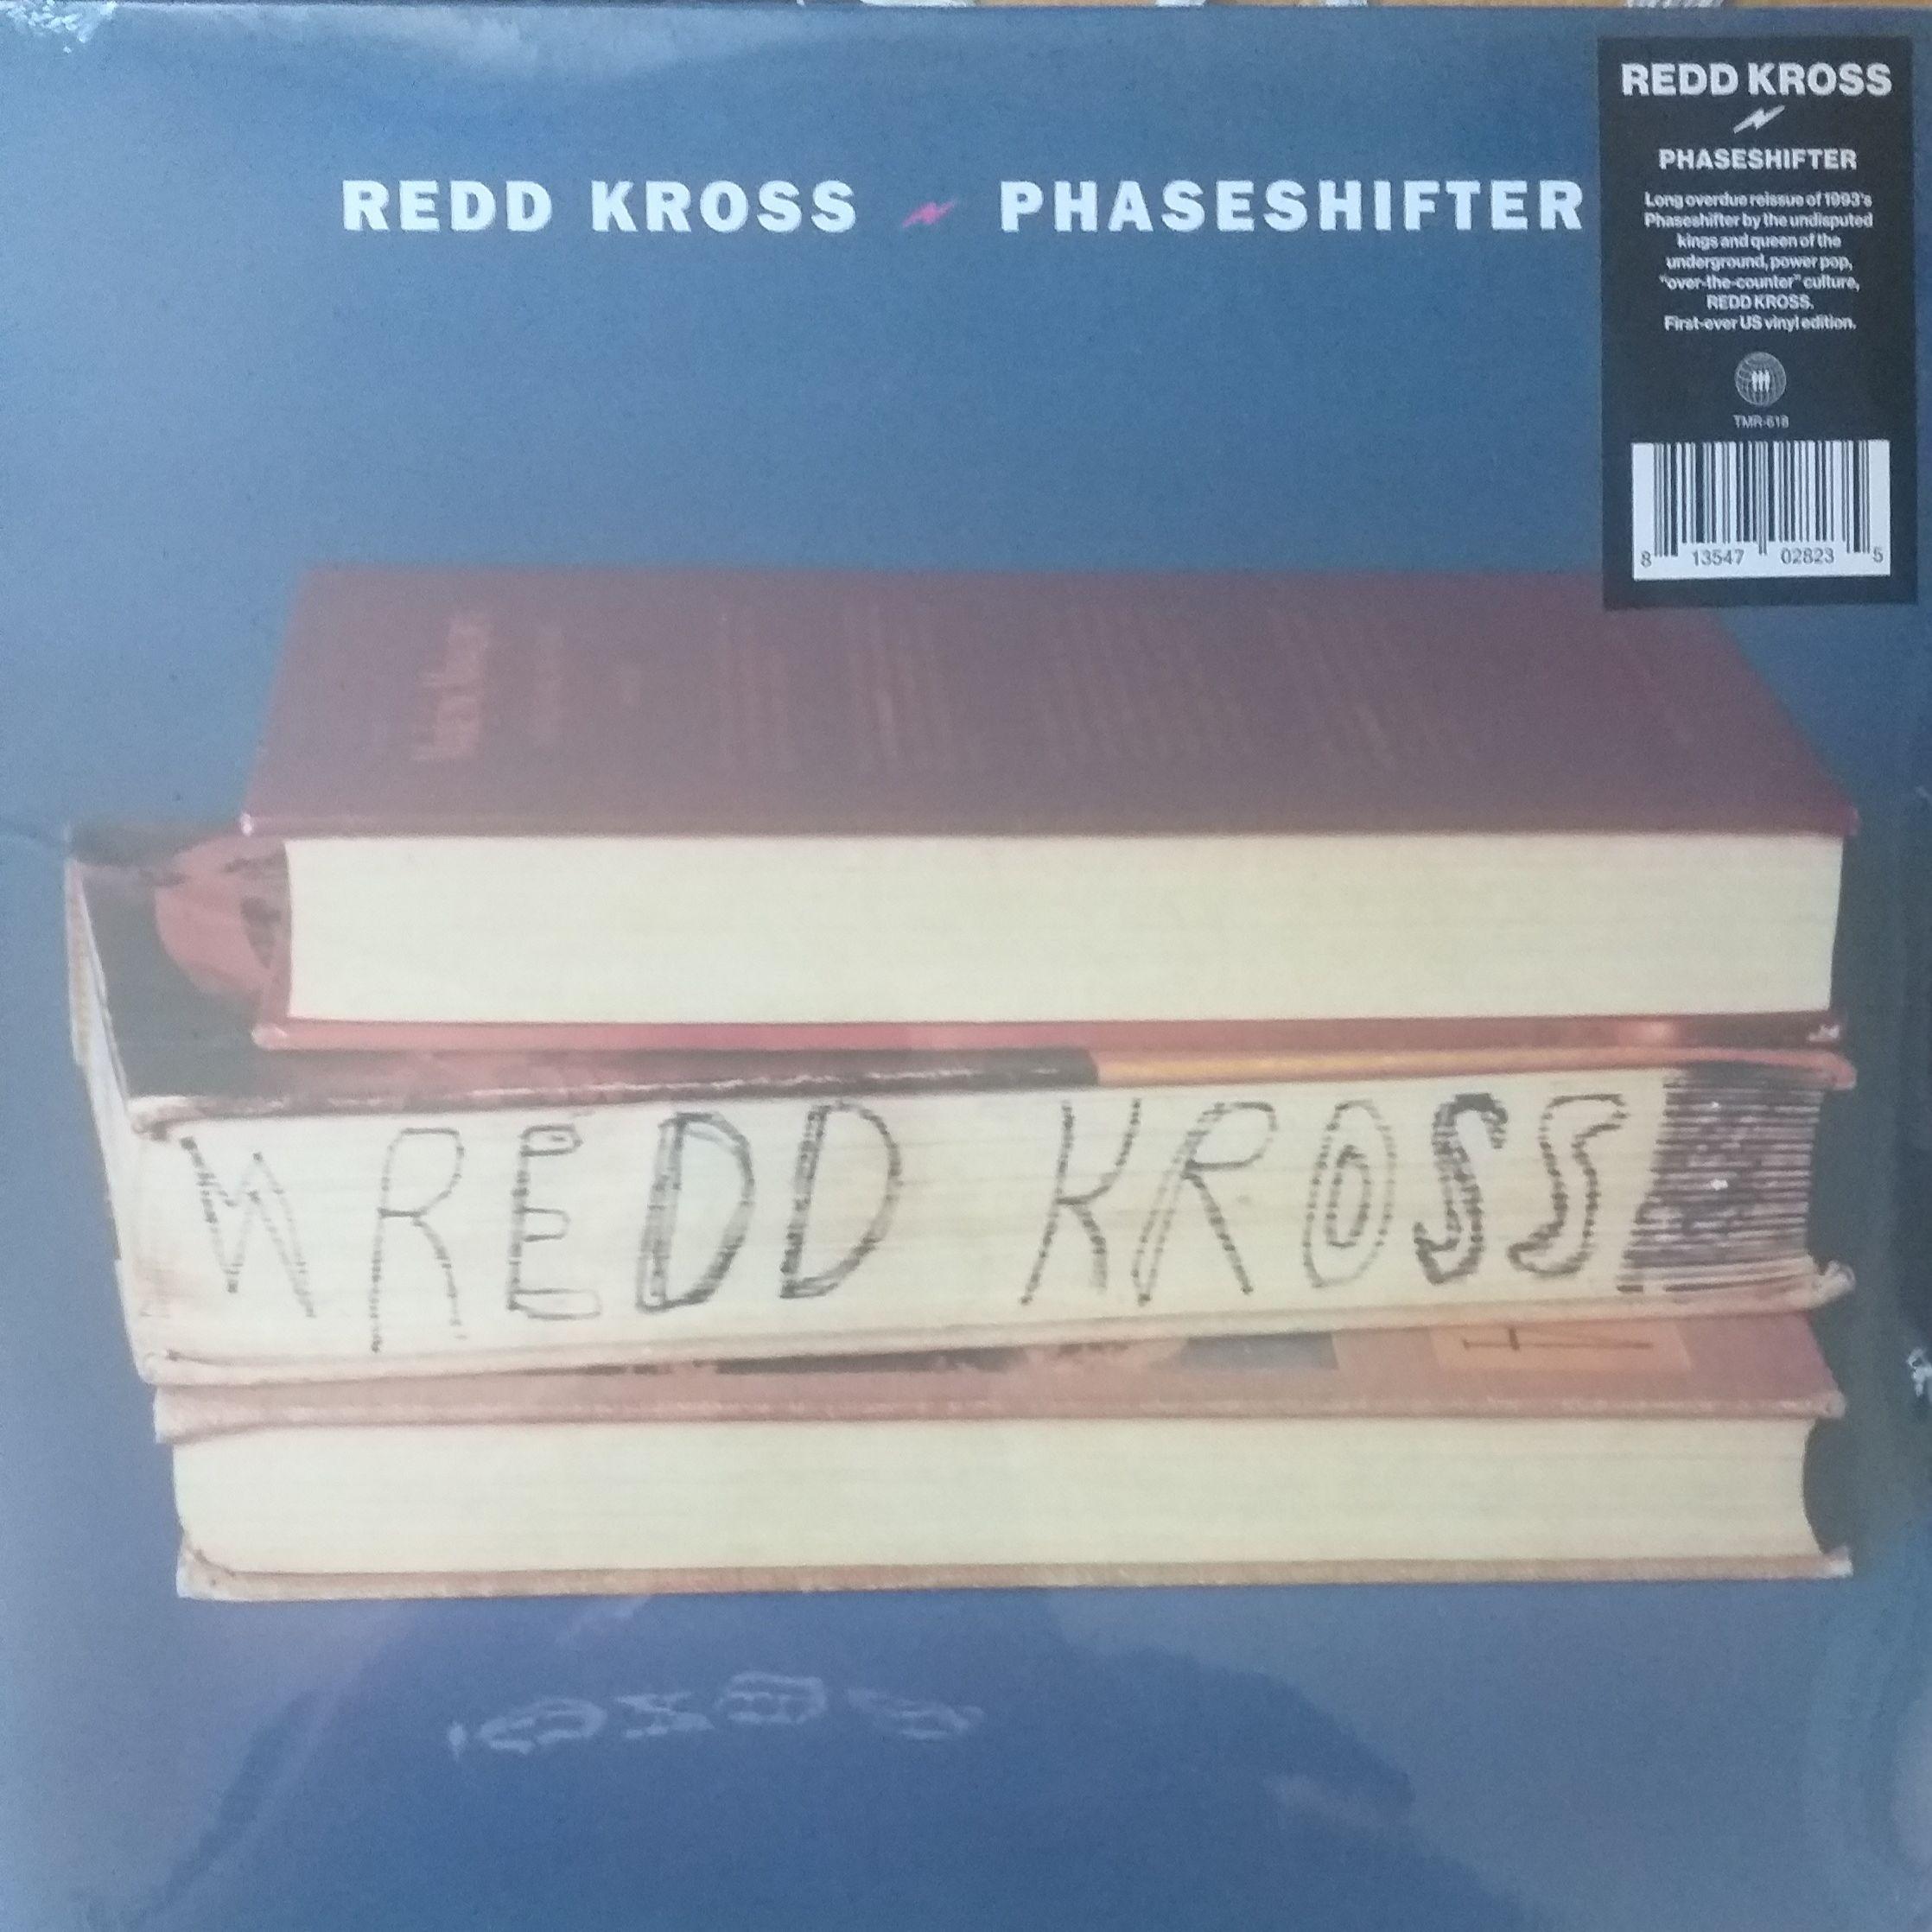 Redd kross Phaseshifter LP undefined